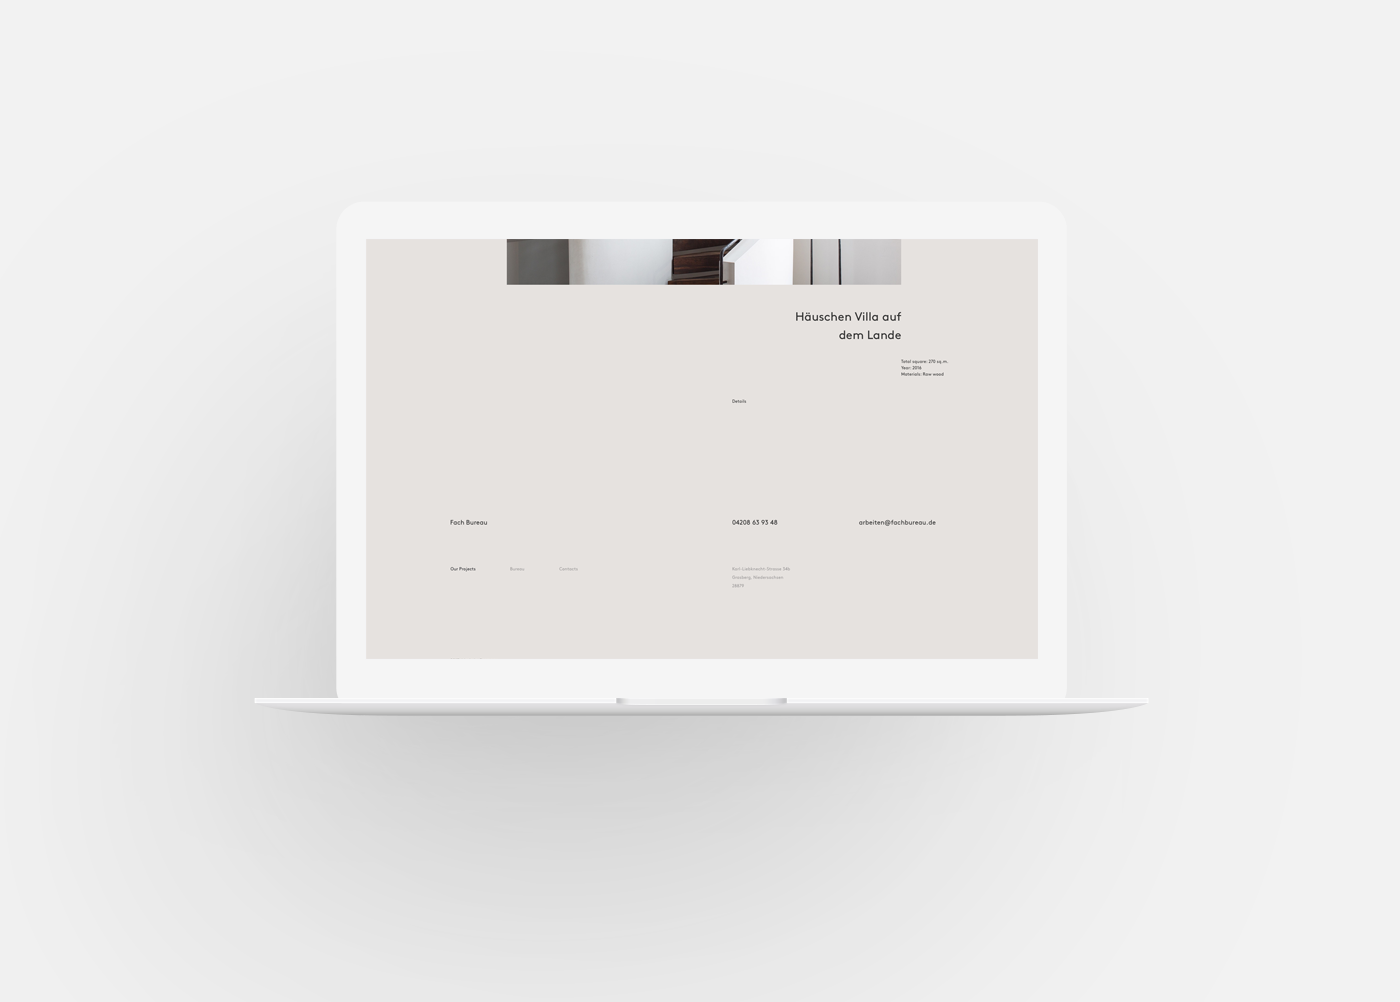 Fach bureau on behance #graphicdesign #website #web #design #graphic